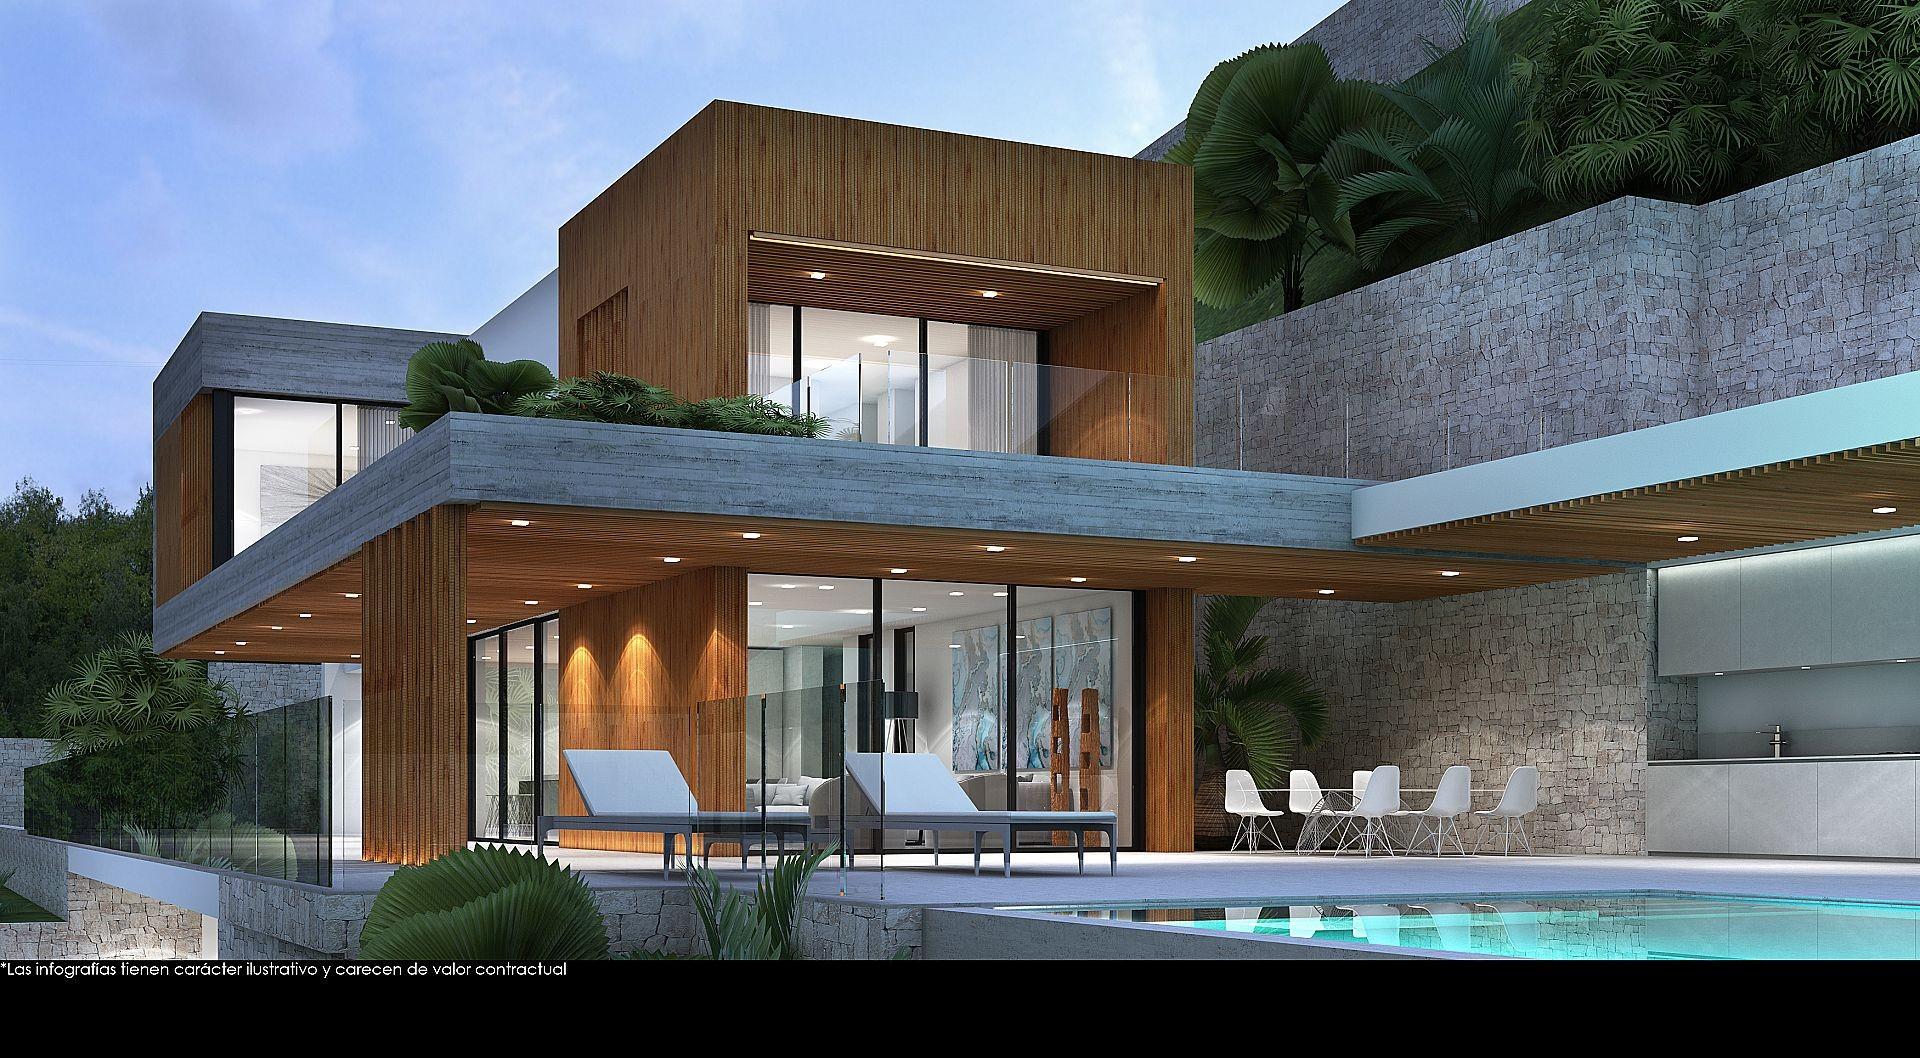 Neubau mit Meerblick, La Fustera - Max Villas